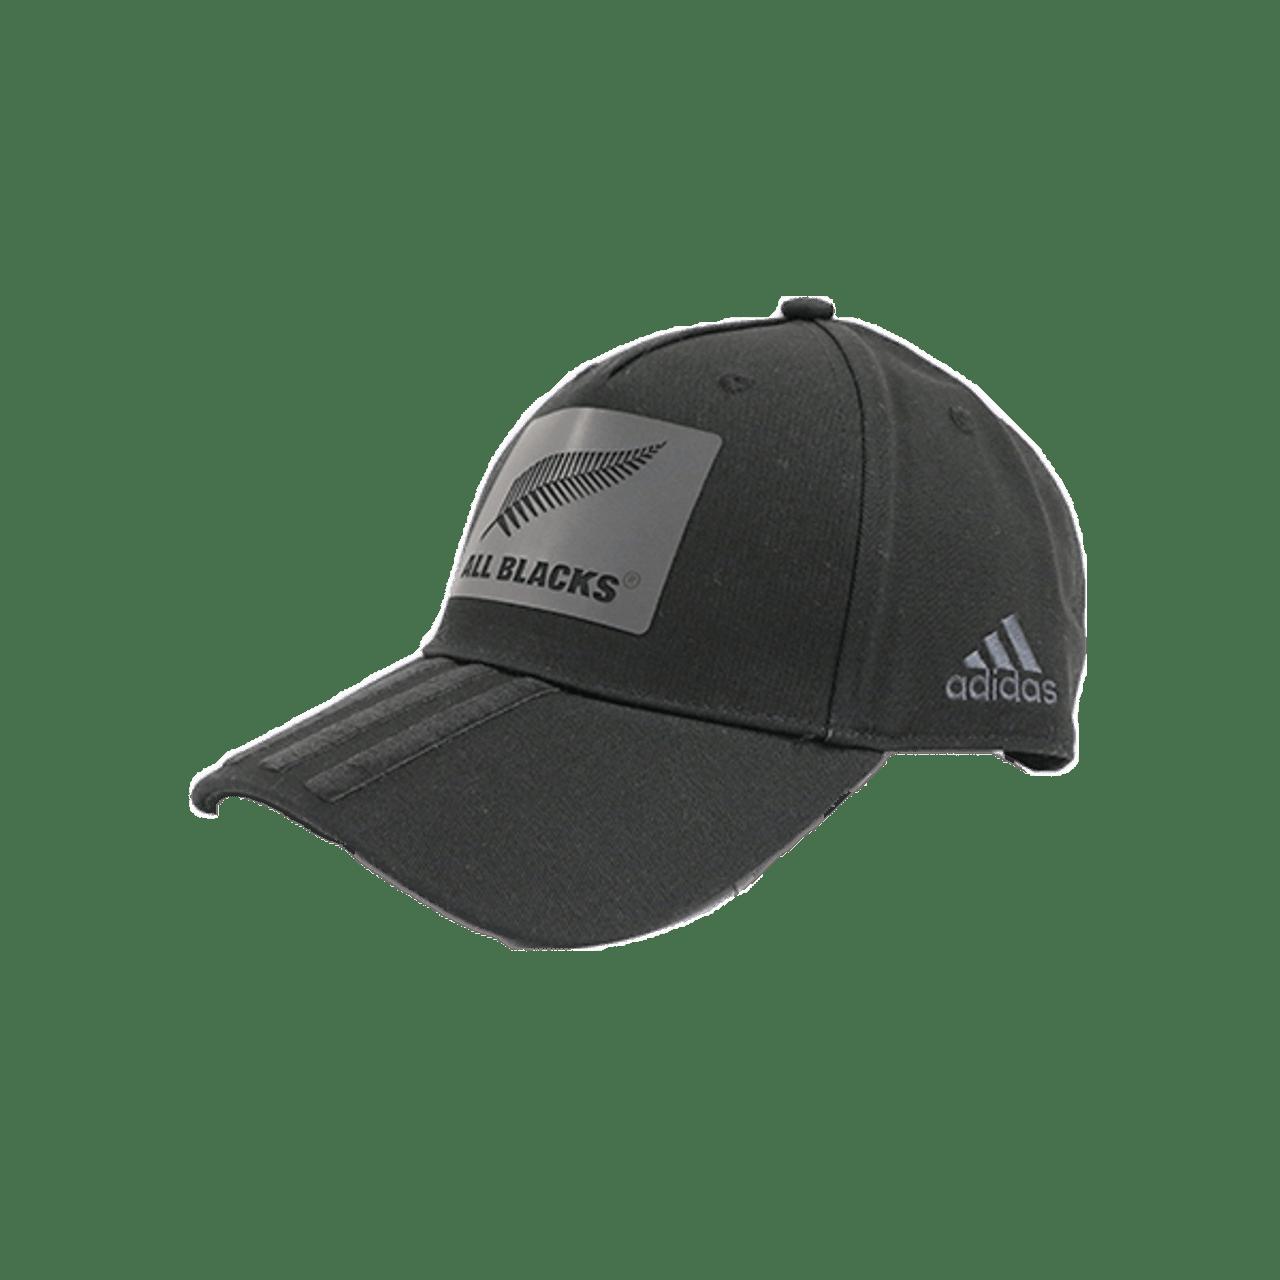 cheap for discount cheaper the latest Adidas All Black 3S Cap- Black